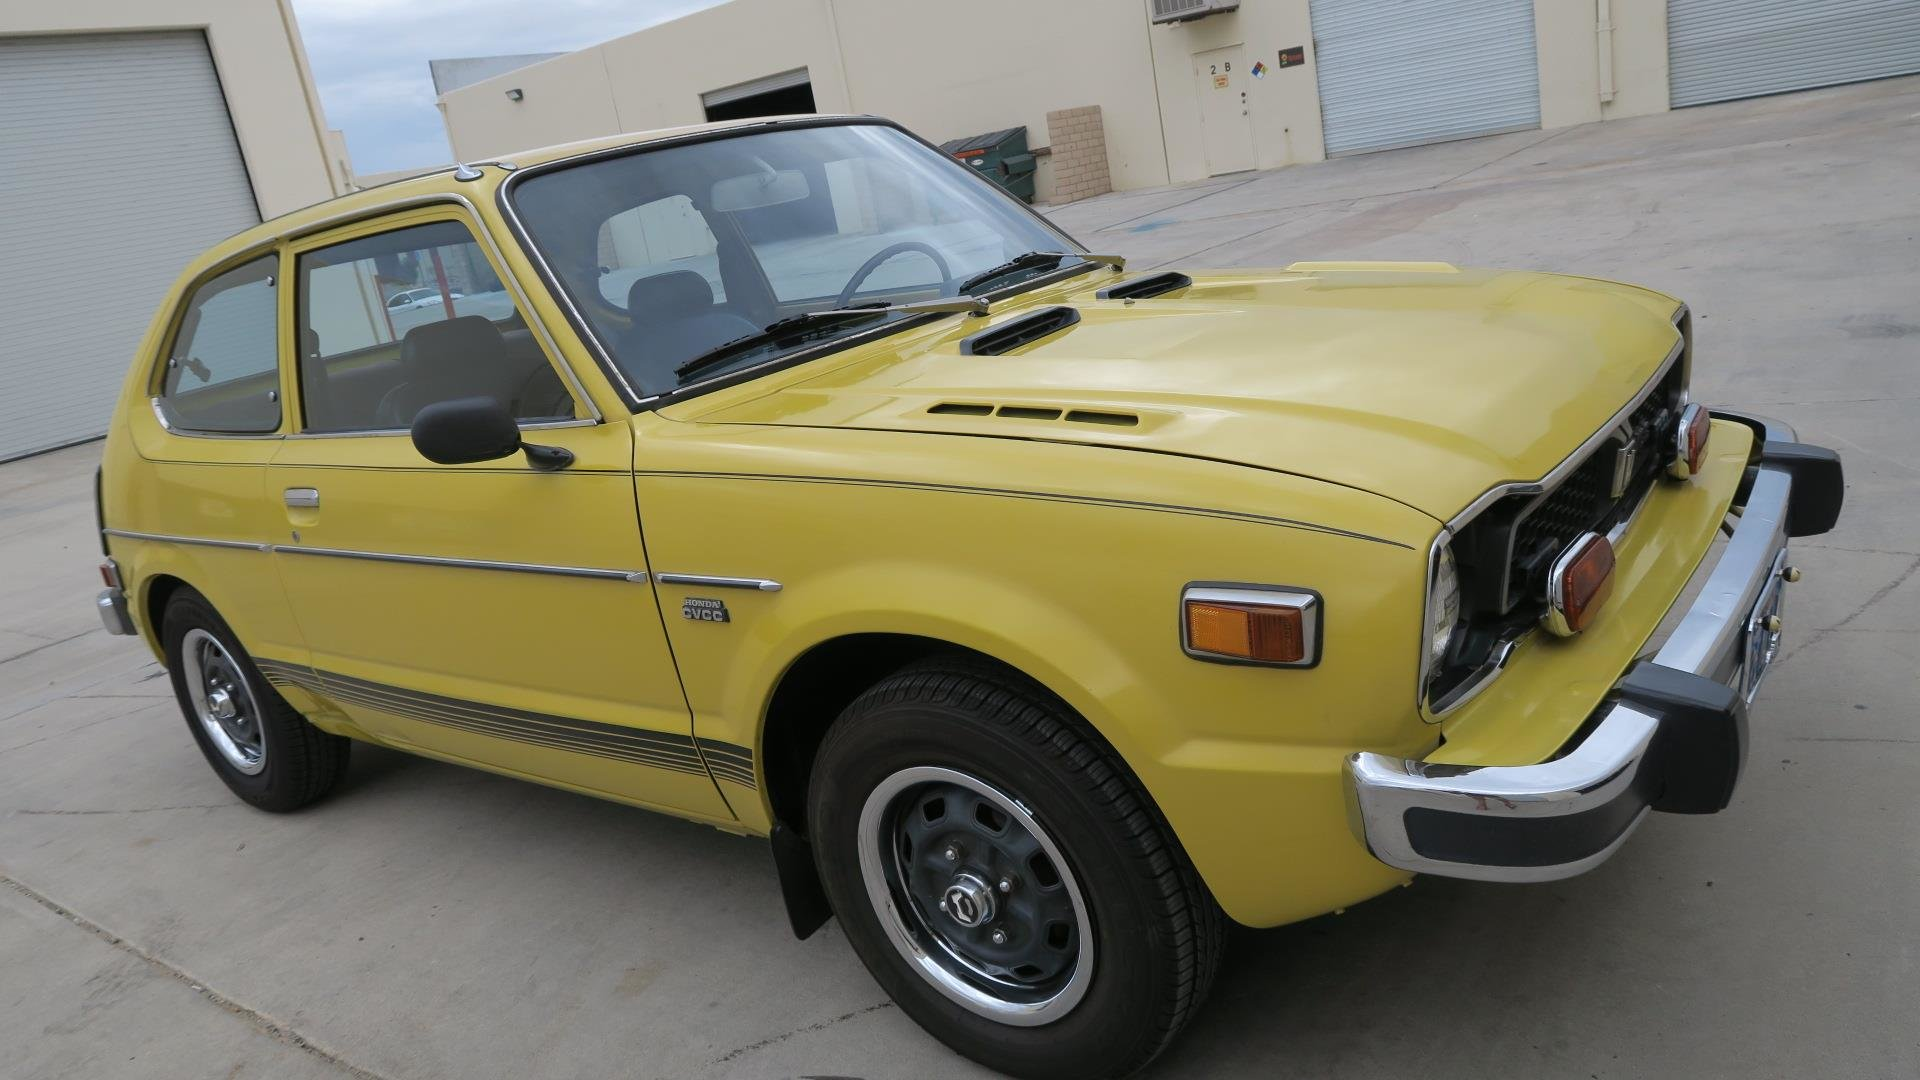 1975 Honda Civic CVCC very Rare 2 Auto Trans $8k spent $8.9  For Sale (picture 2 of 6)